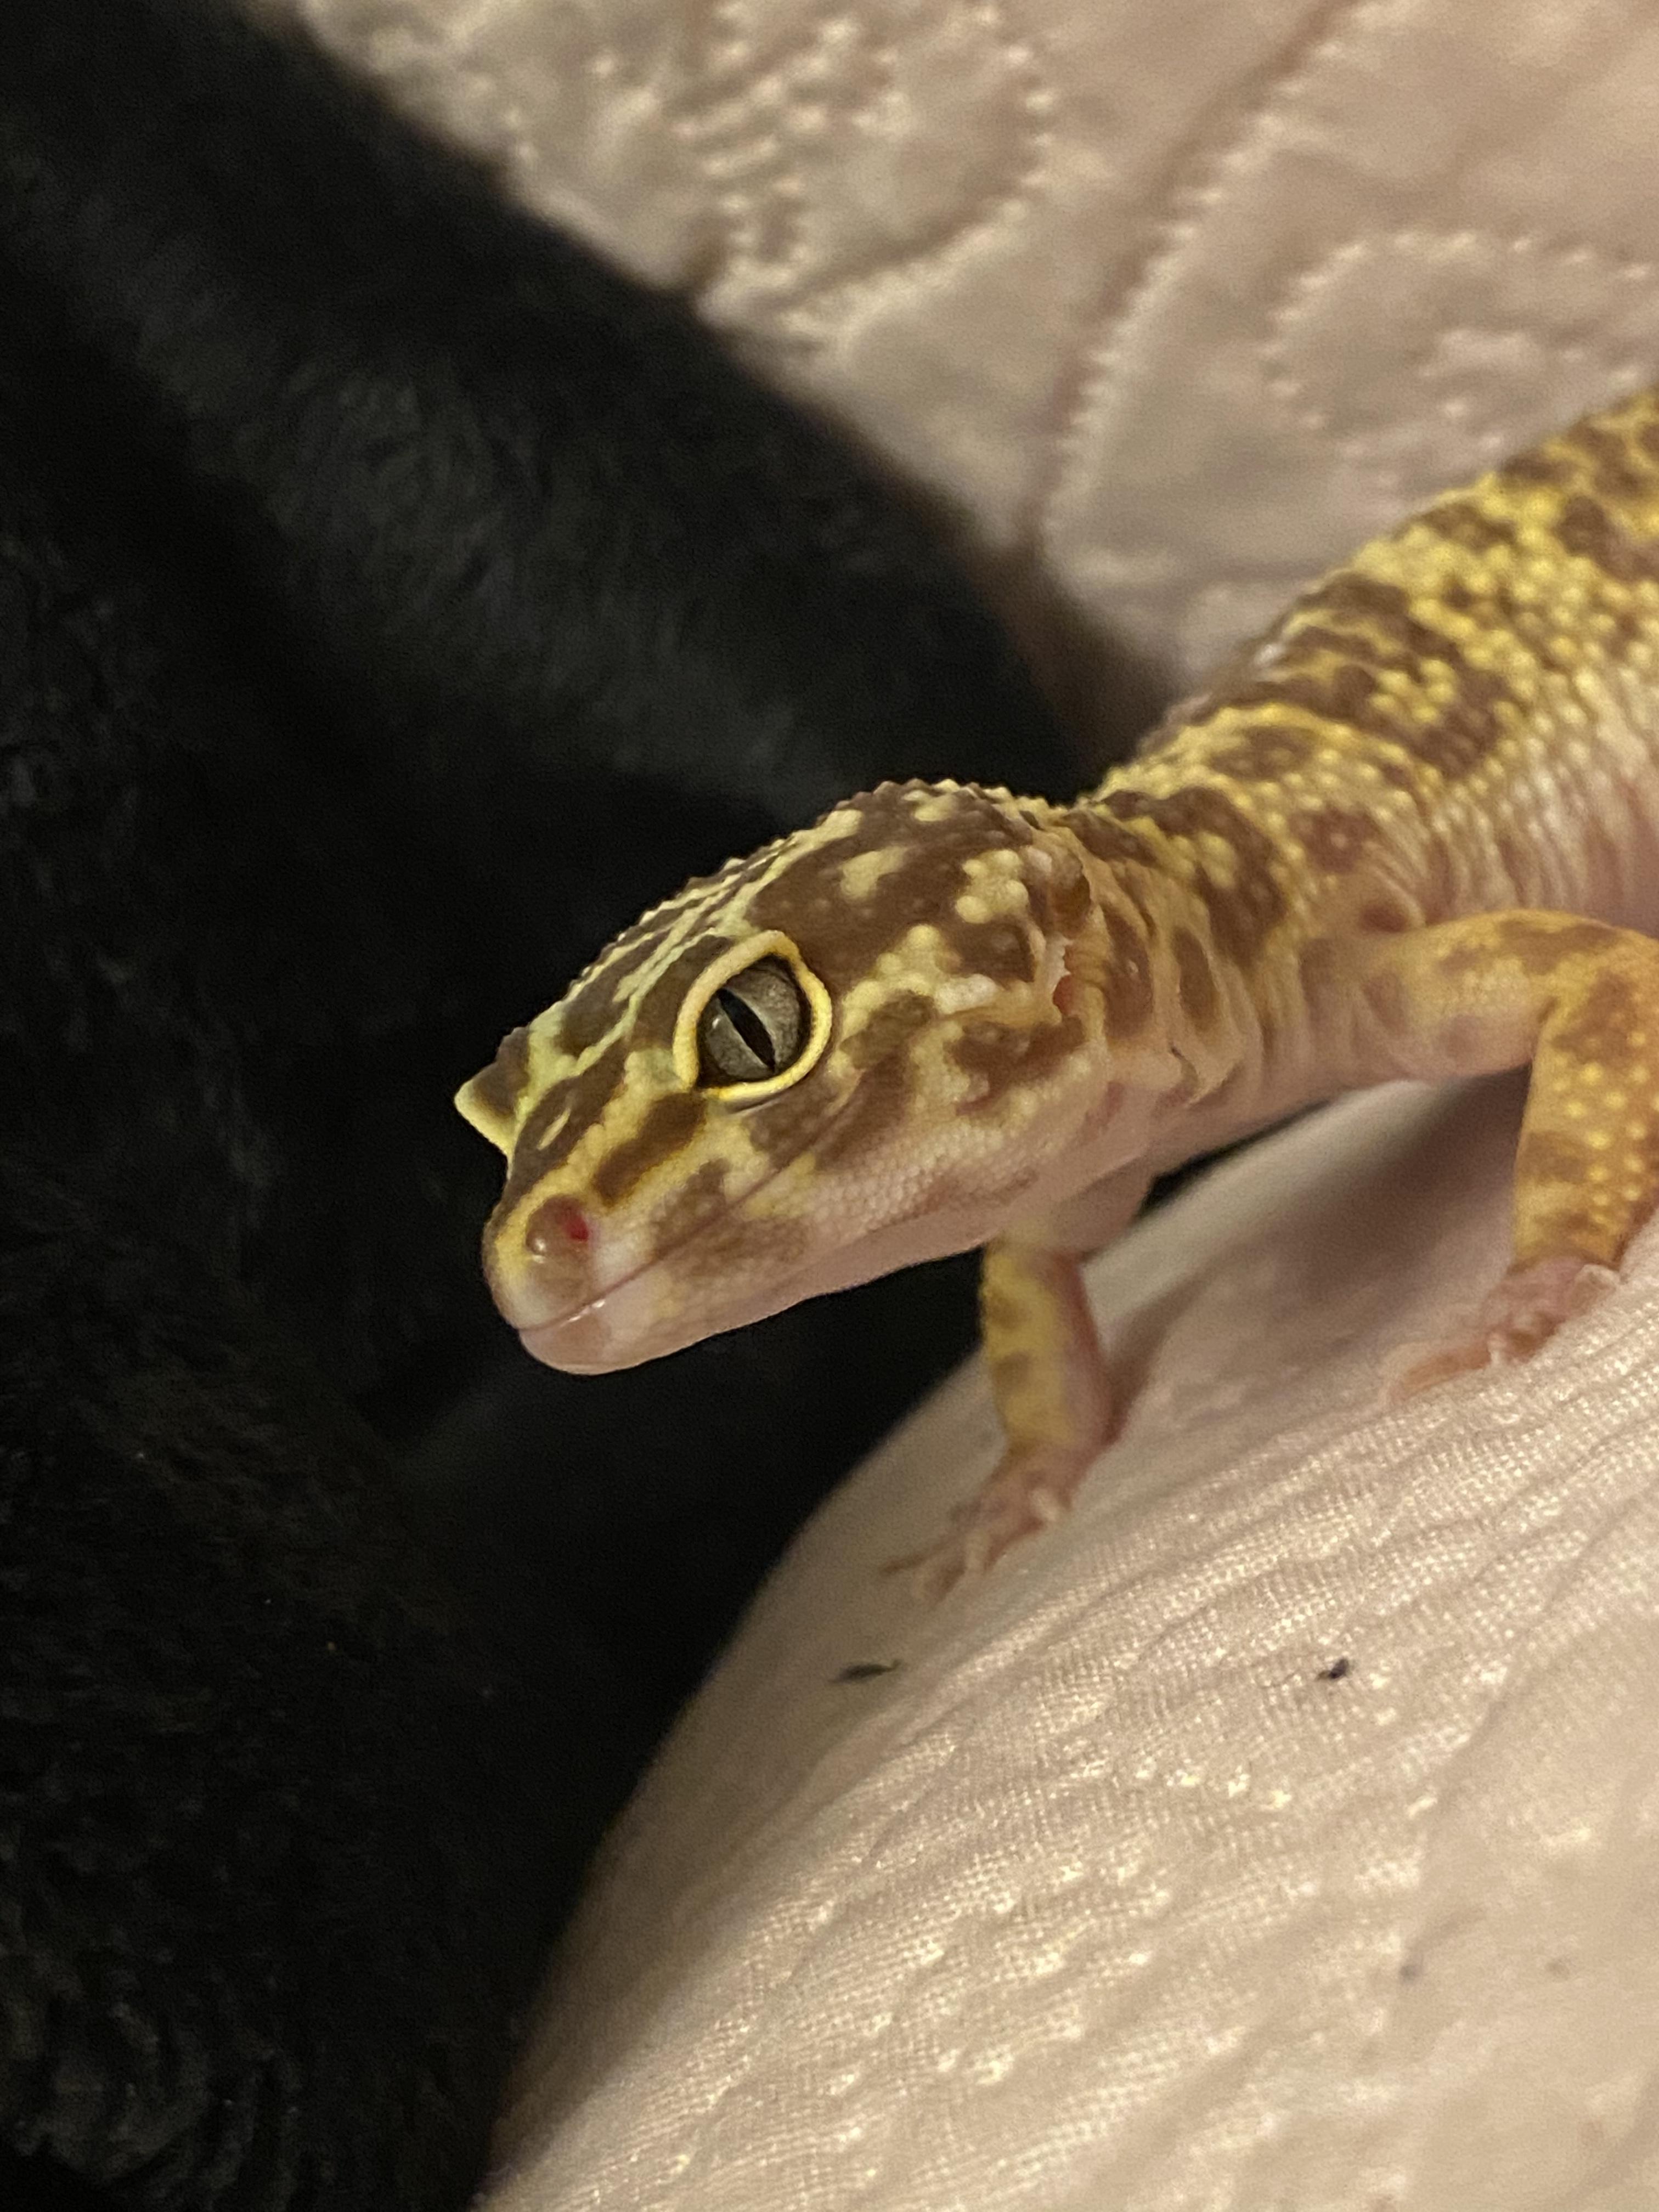 Leopard Gecko Morph-8546444f-e8bd-444d-b7cf-2bd7d4a63c70_1584667571512.jpeg